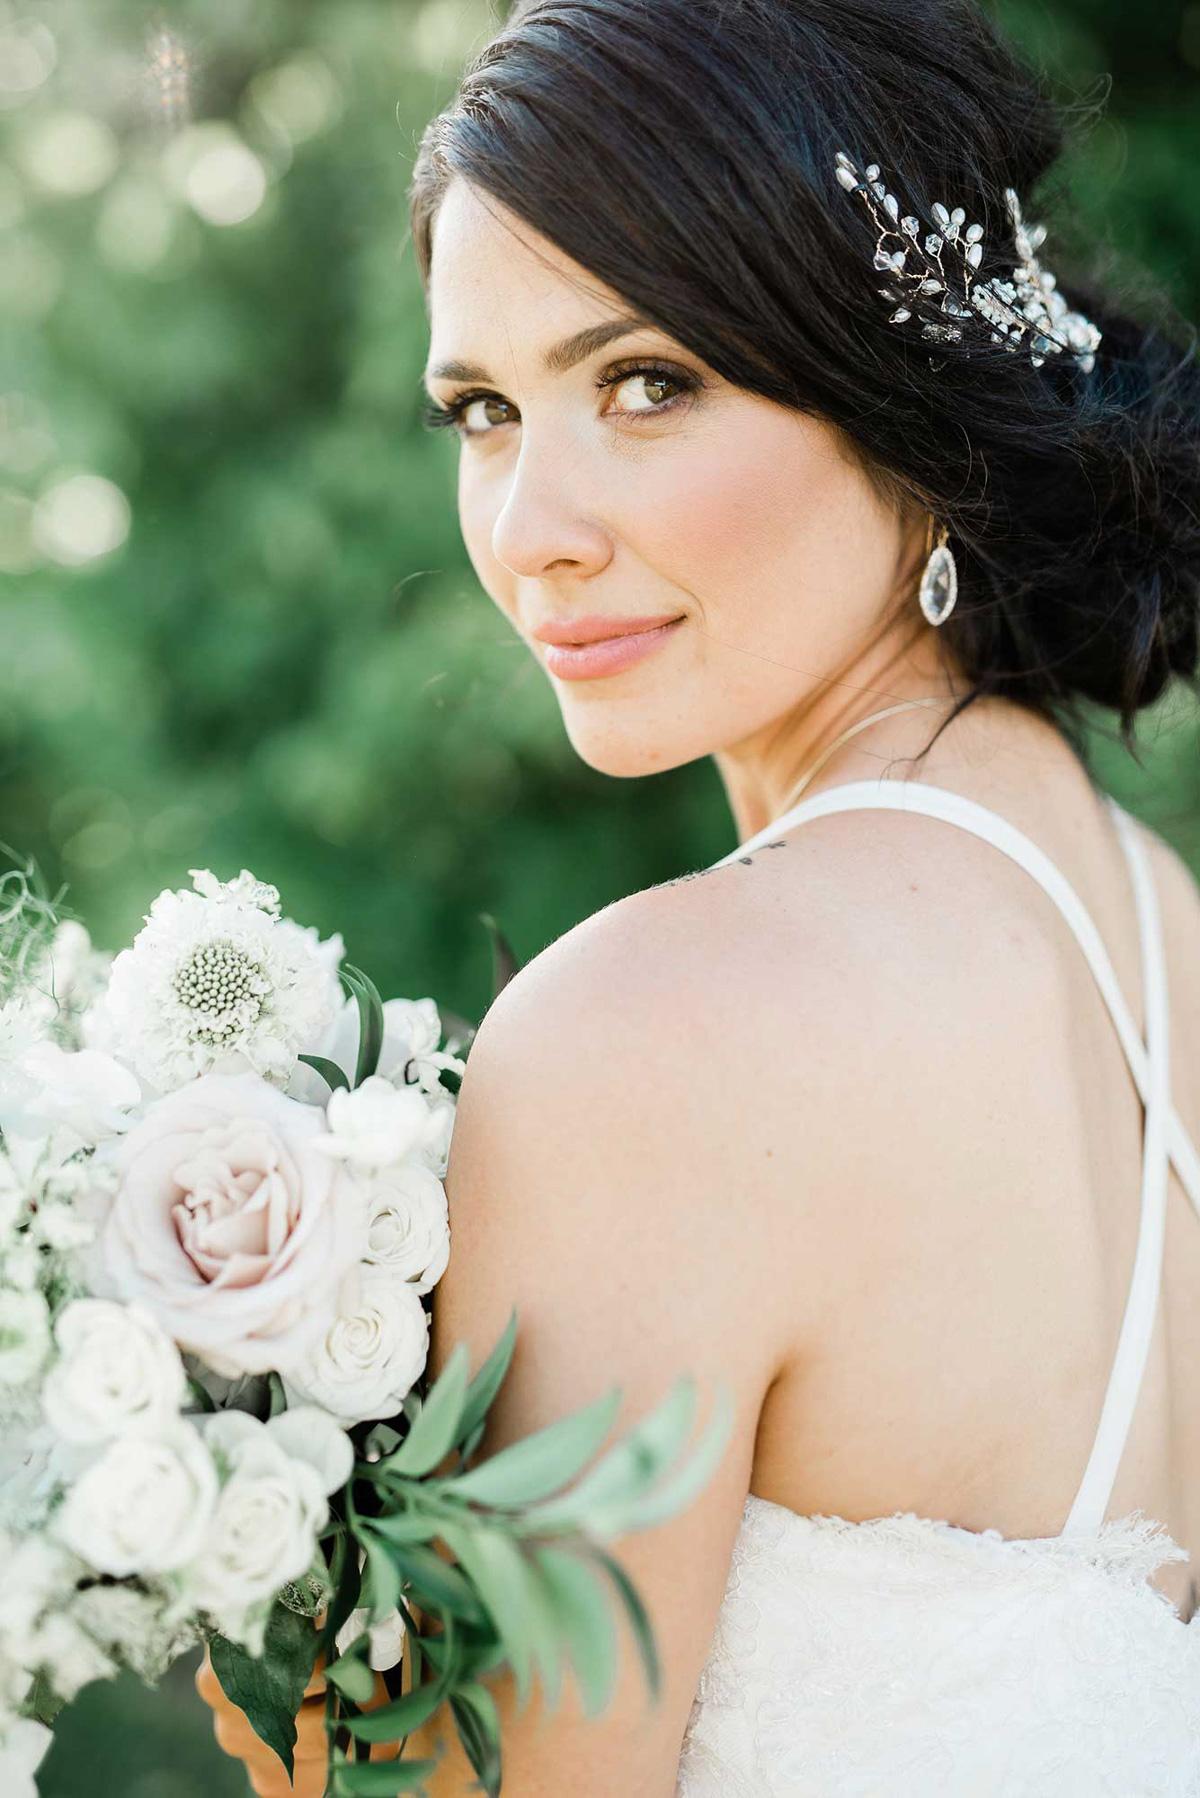 destiny-dawn-photography-vineyard-bride-swish-list-knollwood-golf-and-country-club-ancaster-wedding-editorial-22.jpg